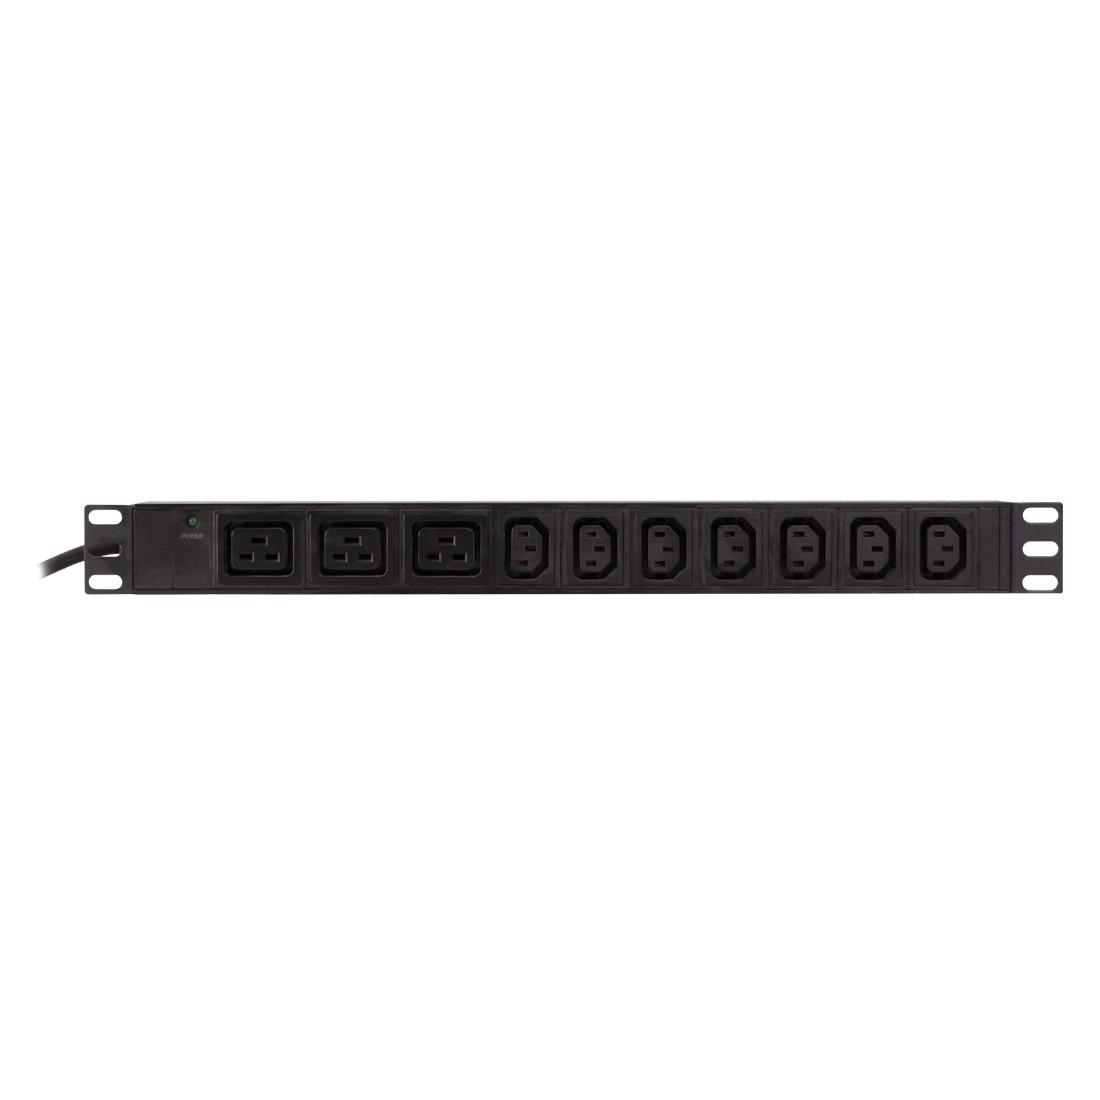 Сетевой фильтр SHIP 700573102 (7 Розеток C13 + 3 розетки типа C19, Black)